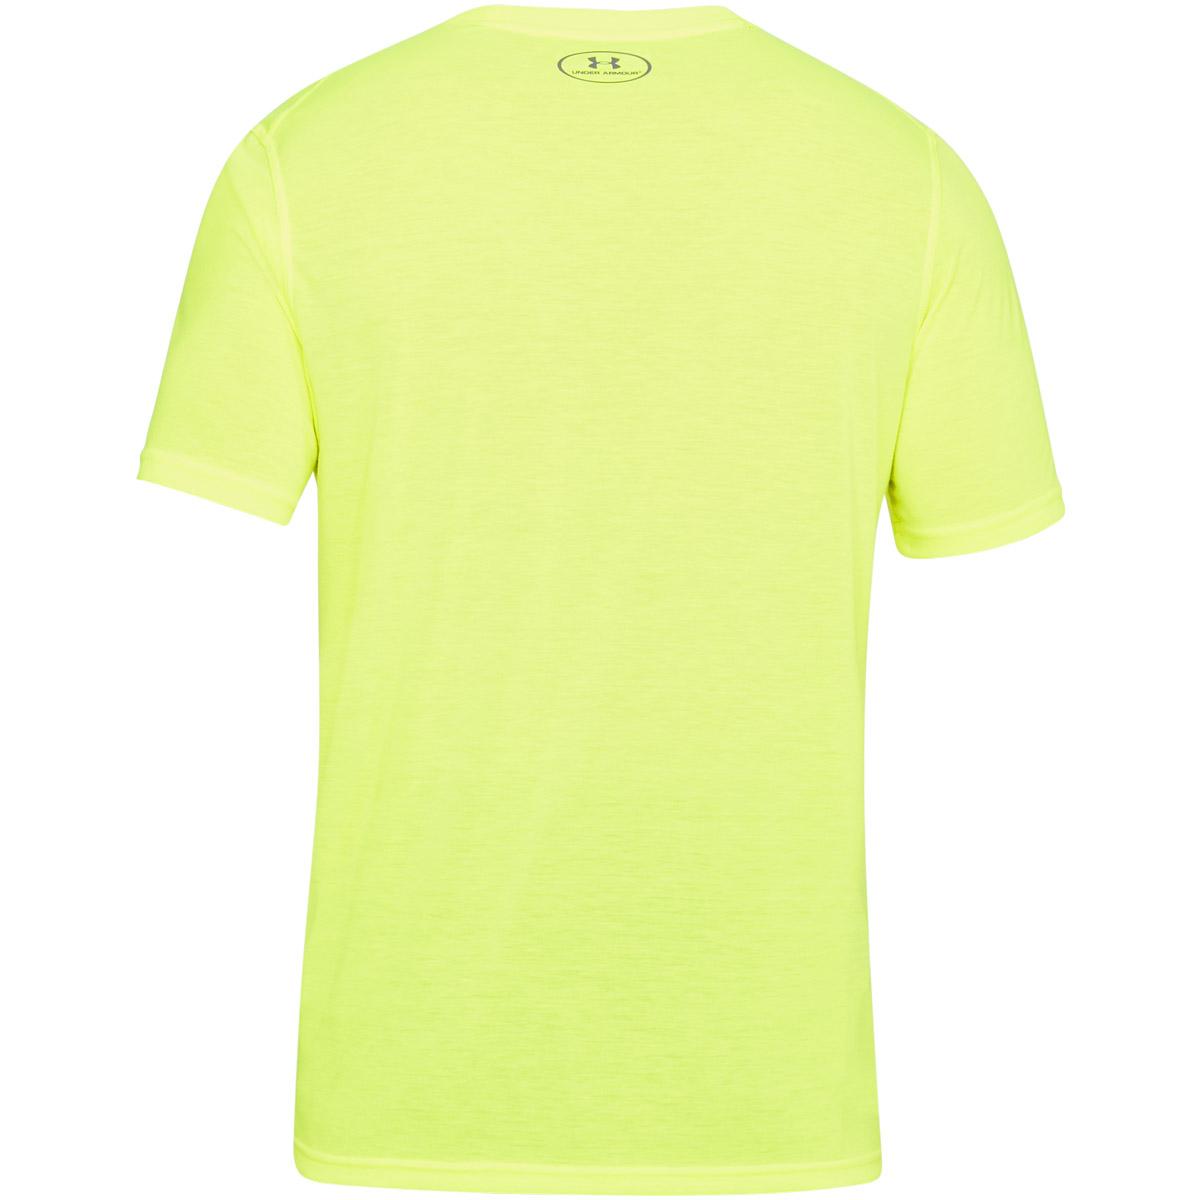 Under-Armour-Mens-UA-Threadborne-Fitted-Short-Sleeve-Gym-Tee-Sport-T-Shirt thumbnail 20